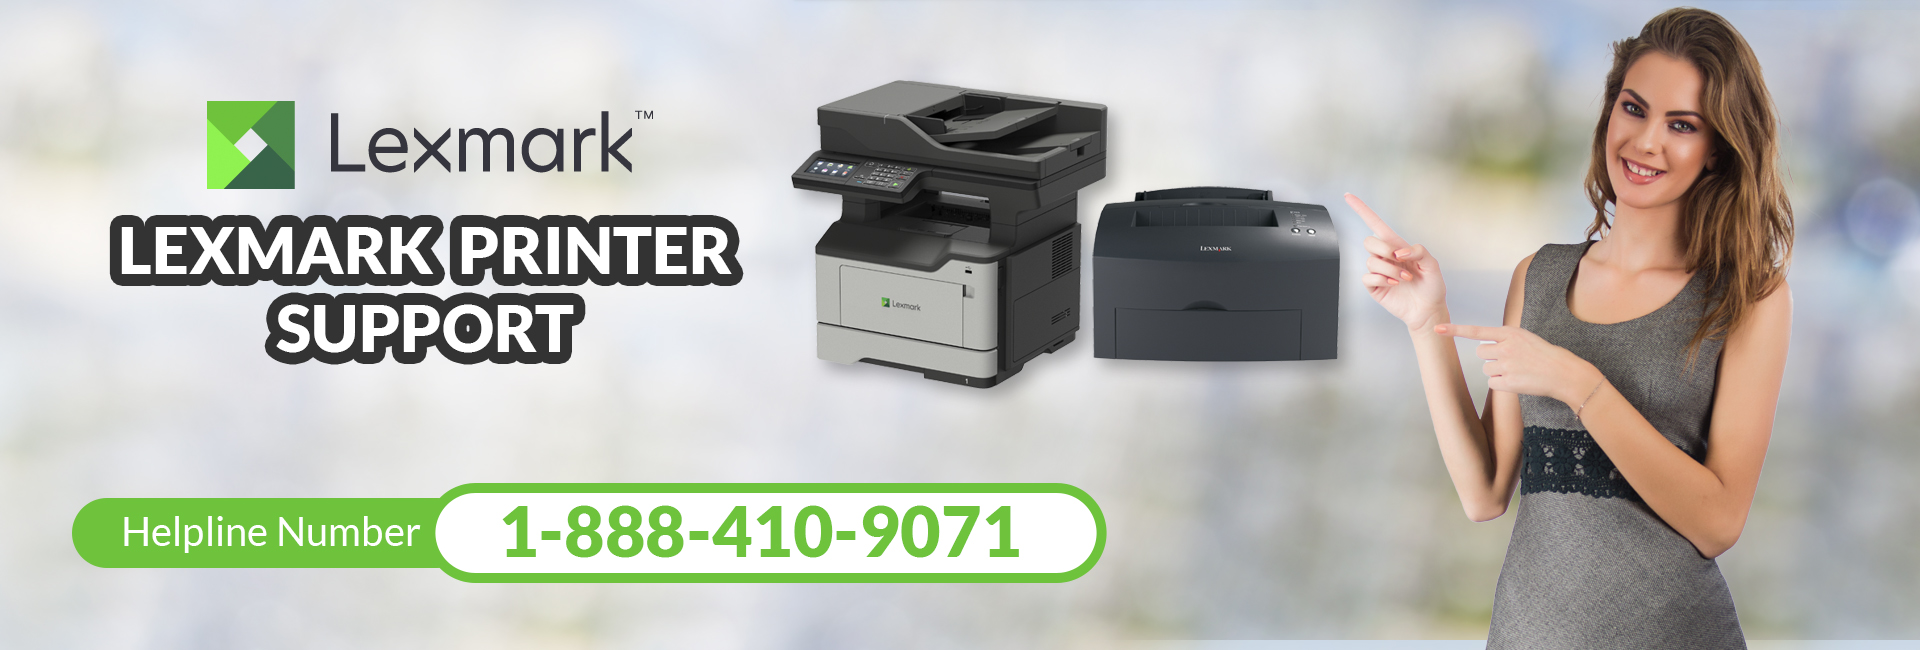 LEXMARK Printer Support 1-888-410-9071